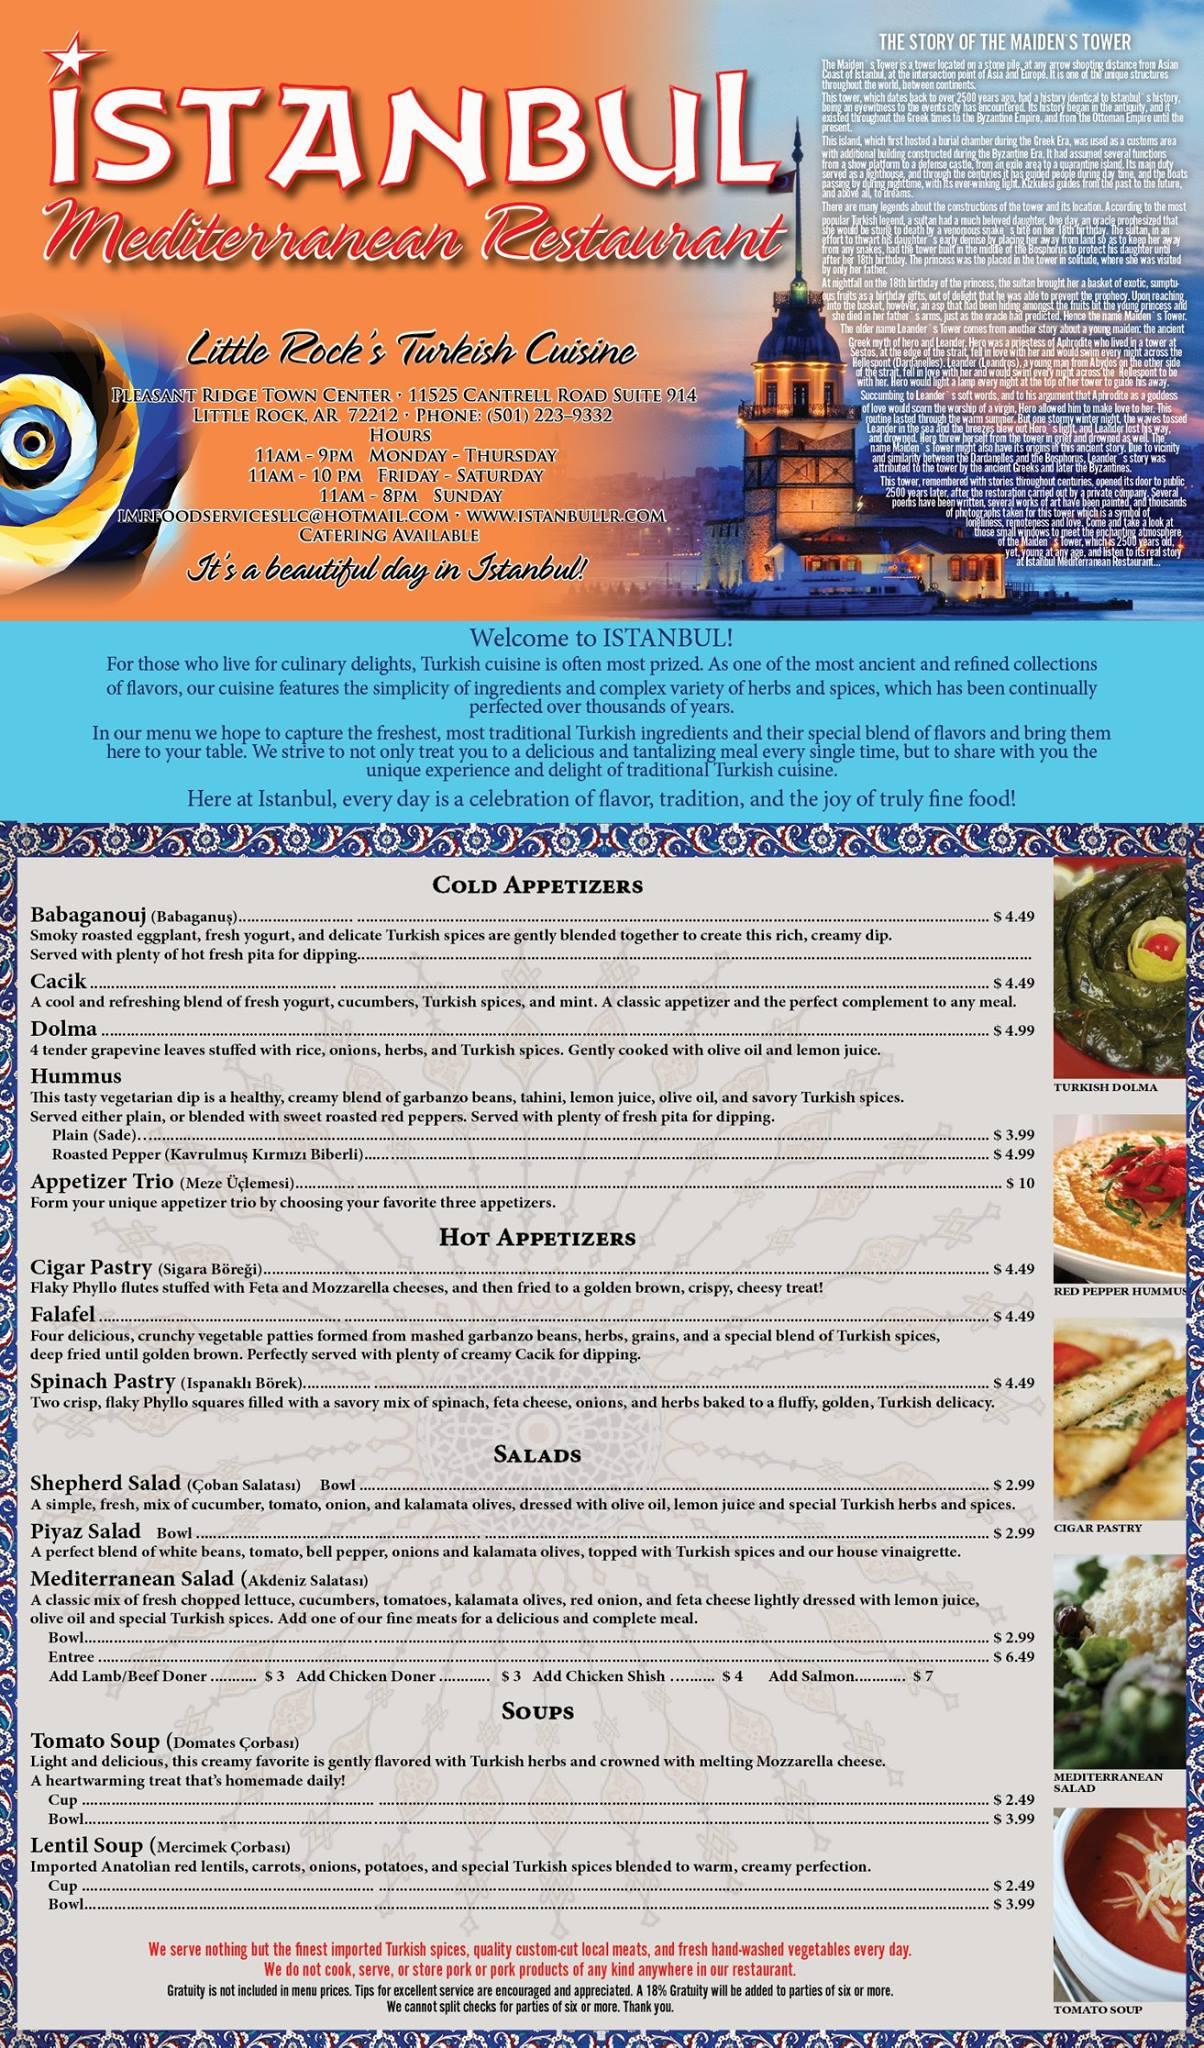 Istanbul Mediterranean Restaurant General Menu